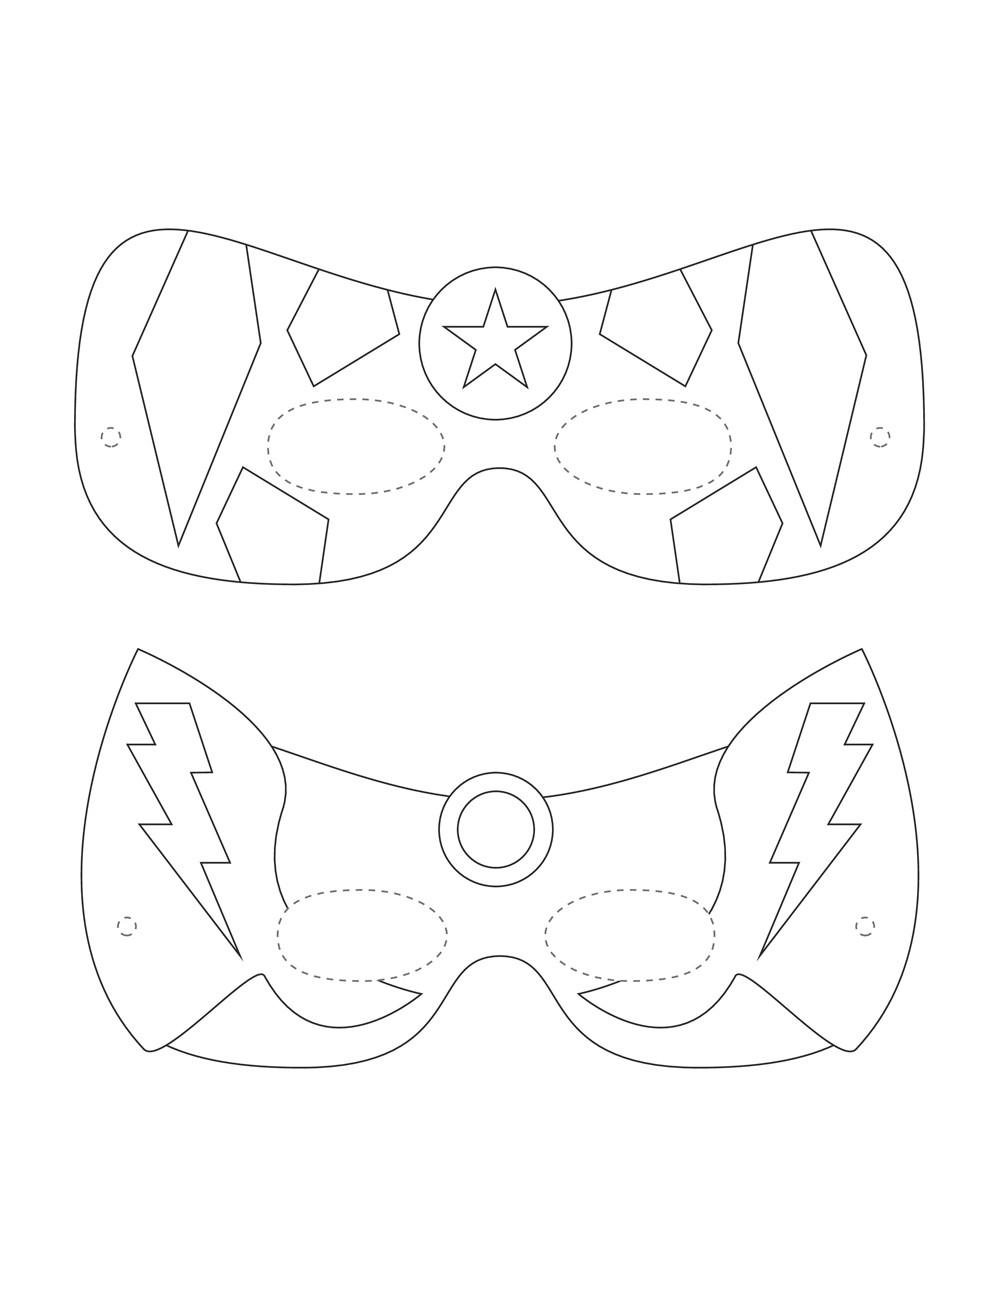 Superhero mask template golfclub superhero mask template maxwellsz